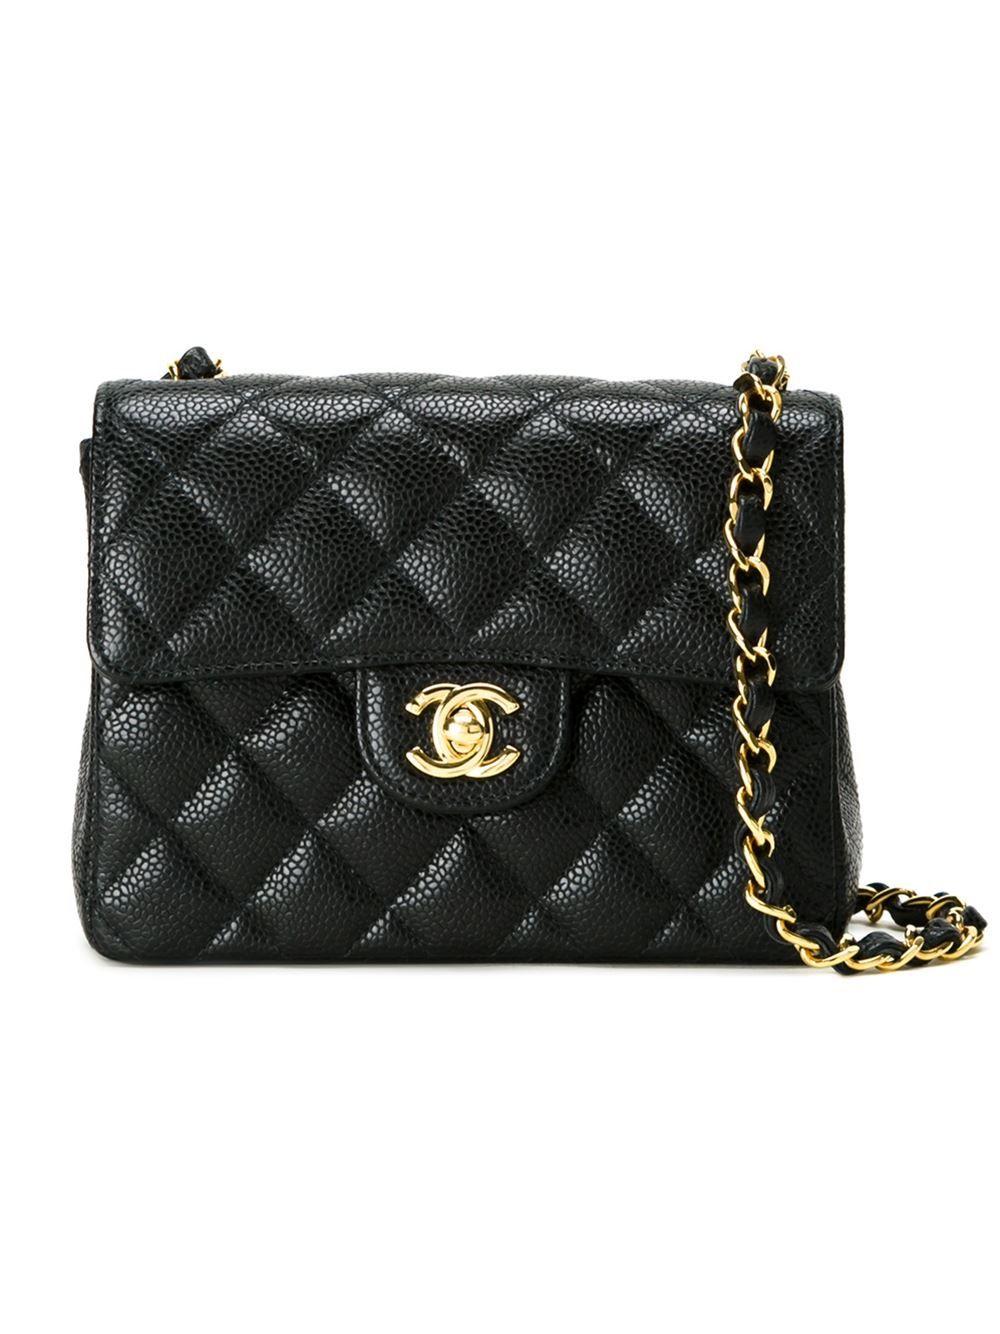 Sac Chanel Vintage Matelassé